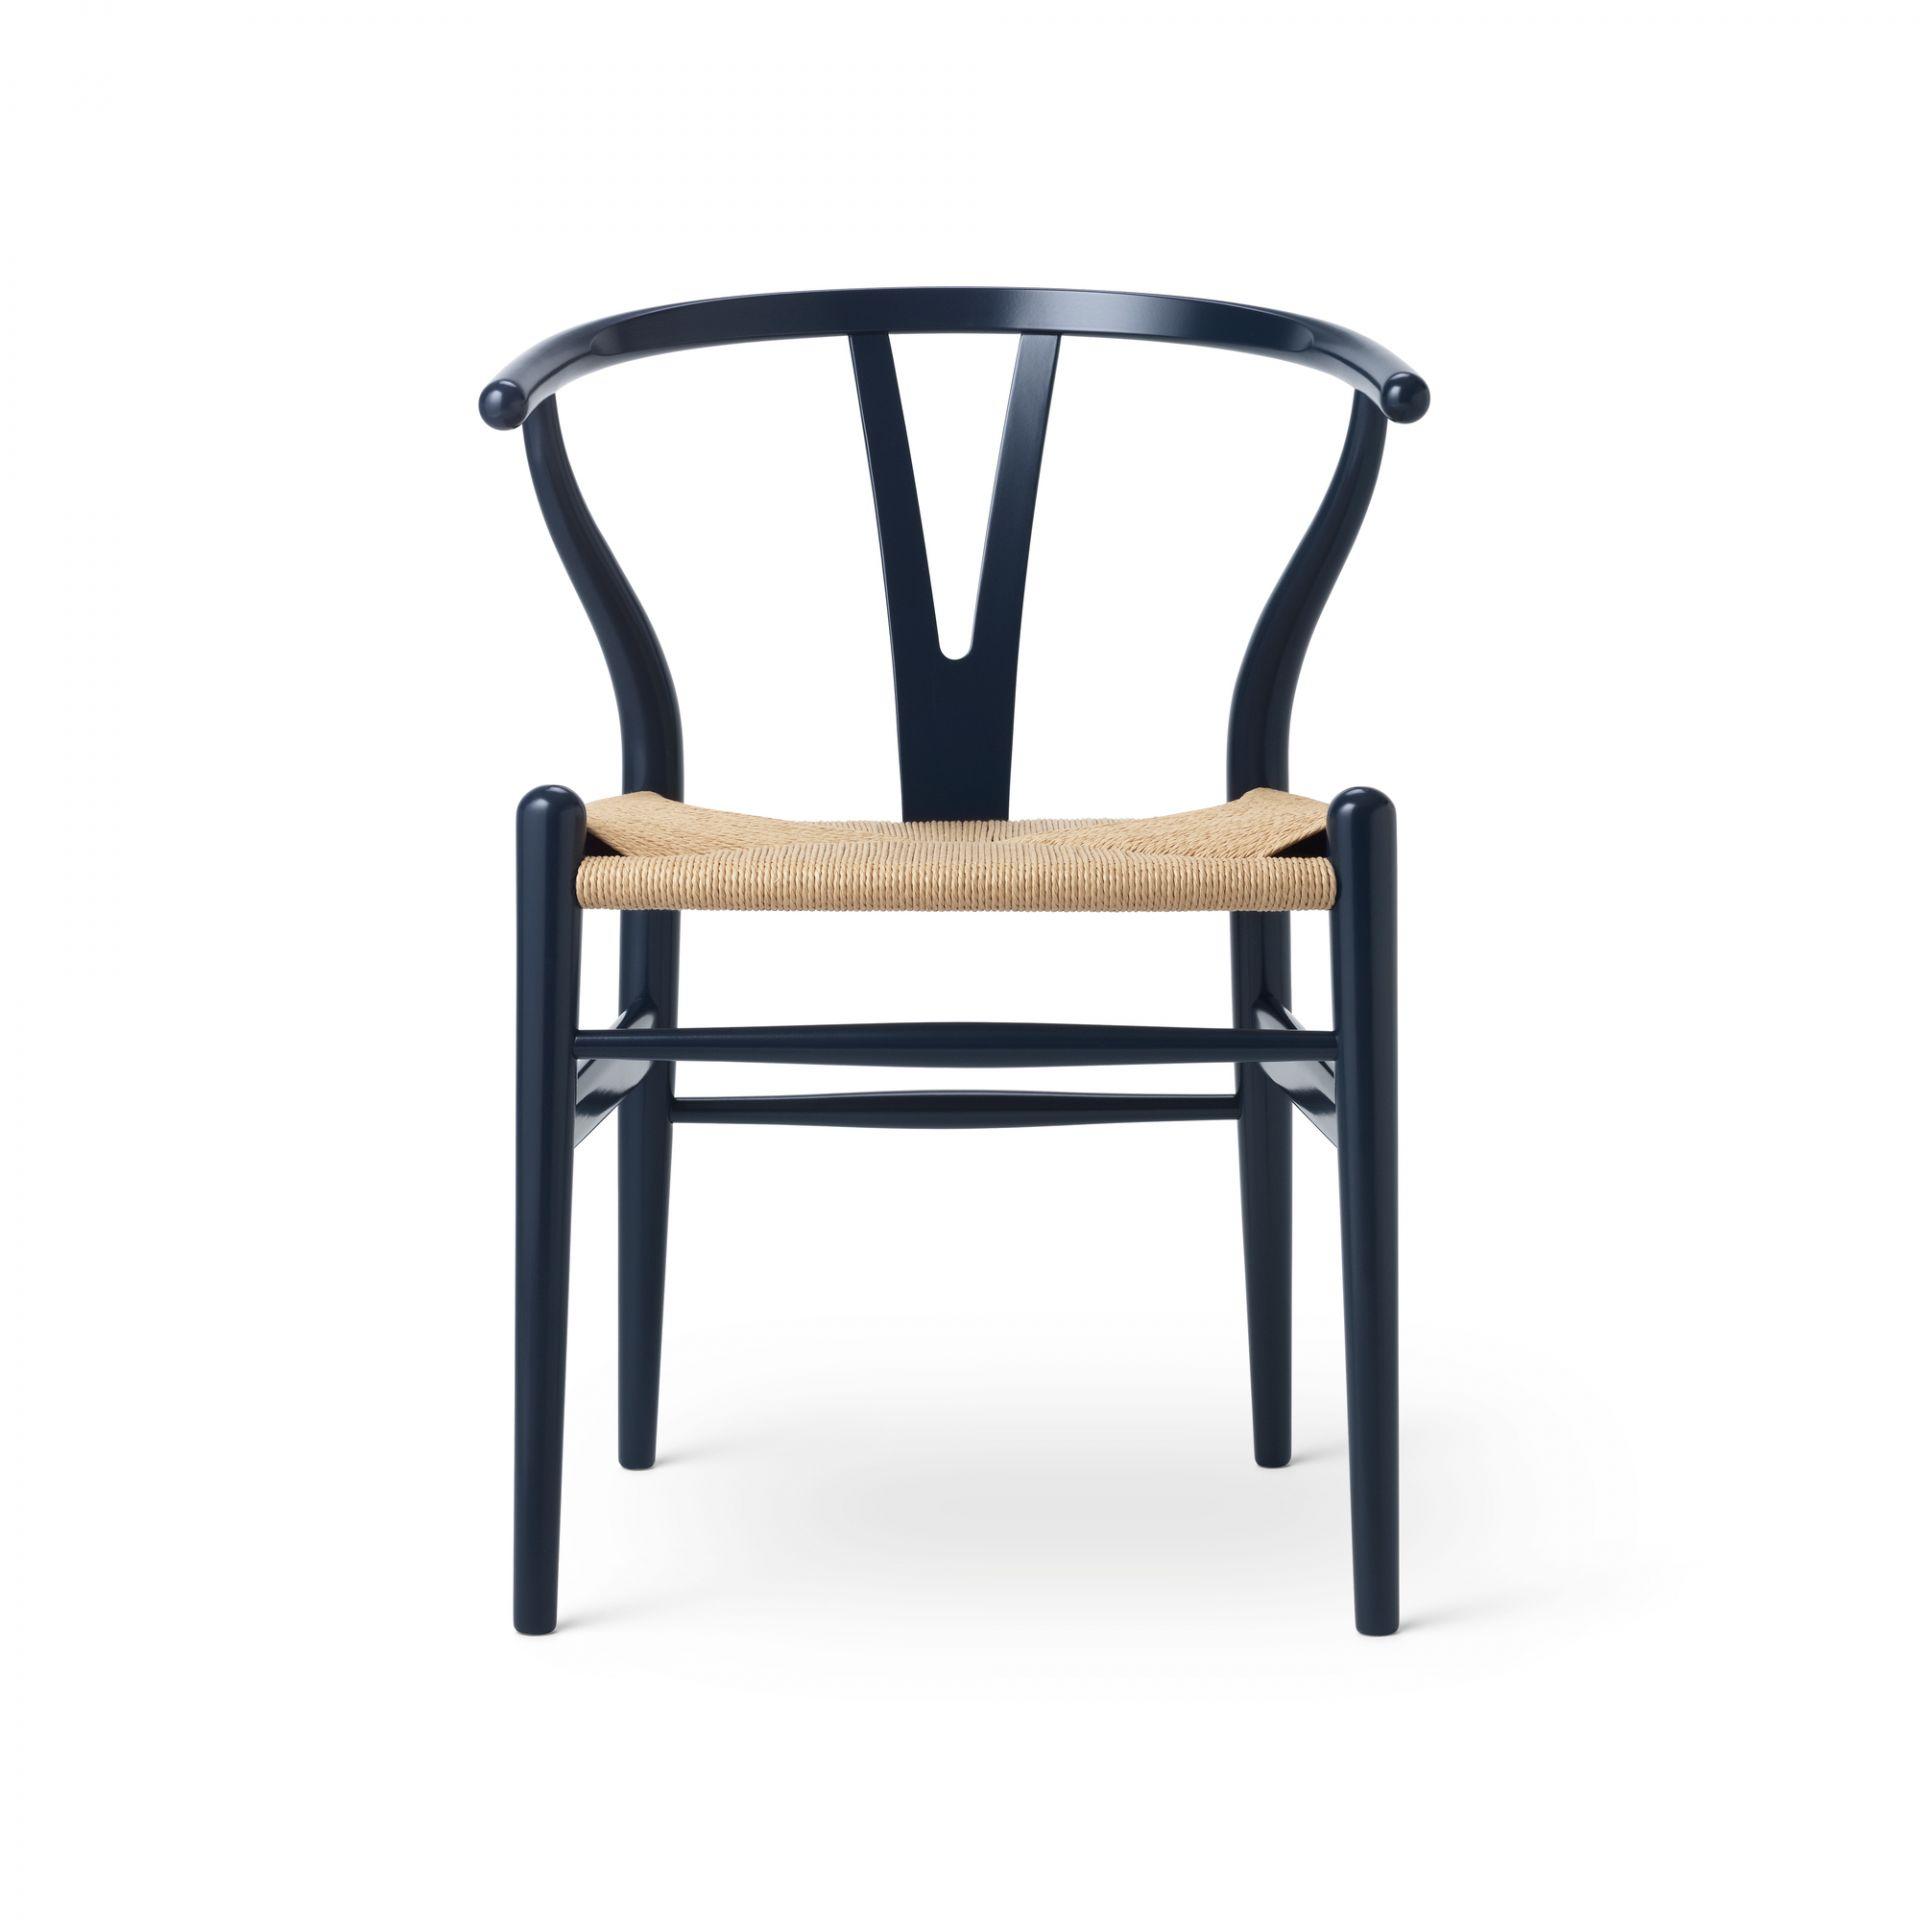 CH24 Wishbone Chair Russet & Blues Russet Red Carl Hansen & Søn